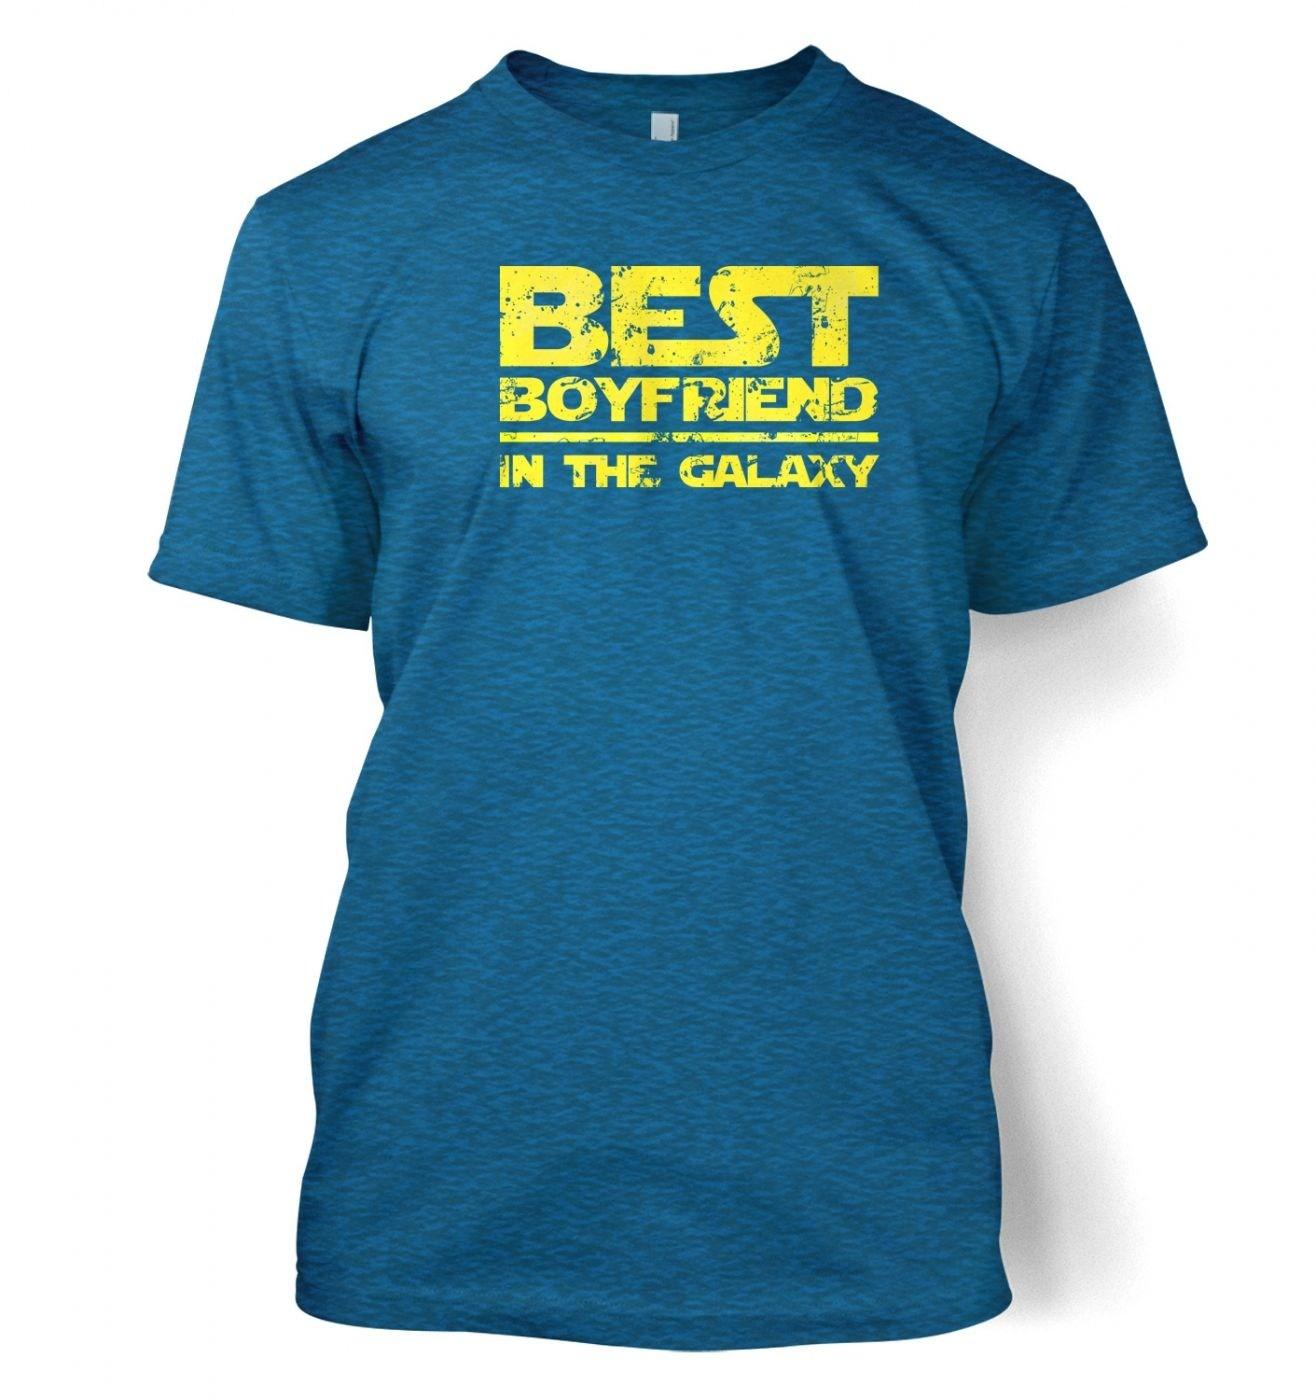 Best Boyfriend In The Galaxy men's t-shirt